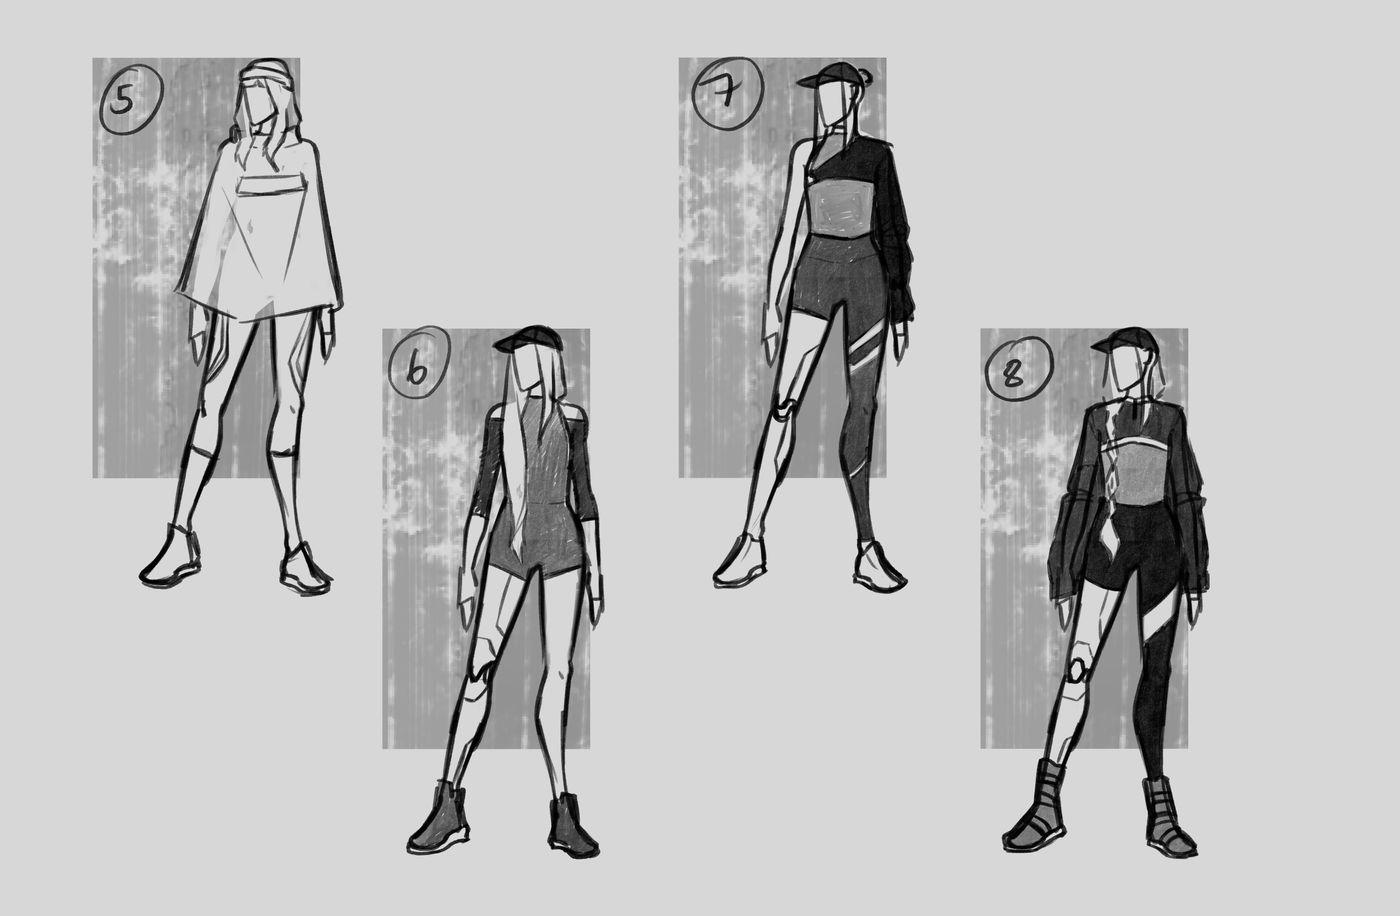 Steer Jasmine %20 Scme3420 Rookies %20 Character Design Thumbnails02 Jasminesteer